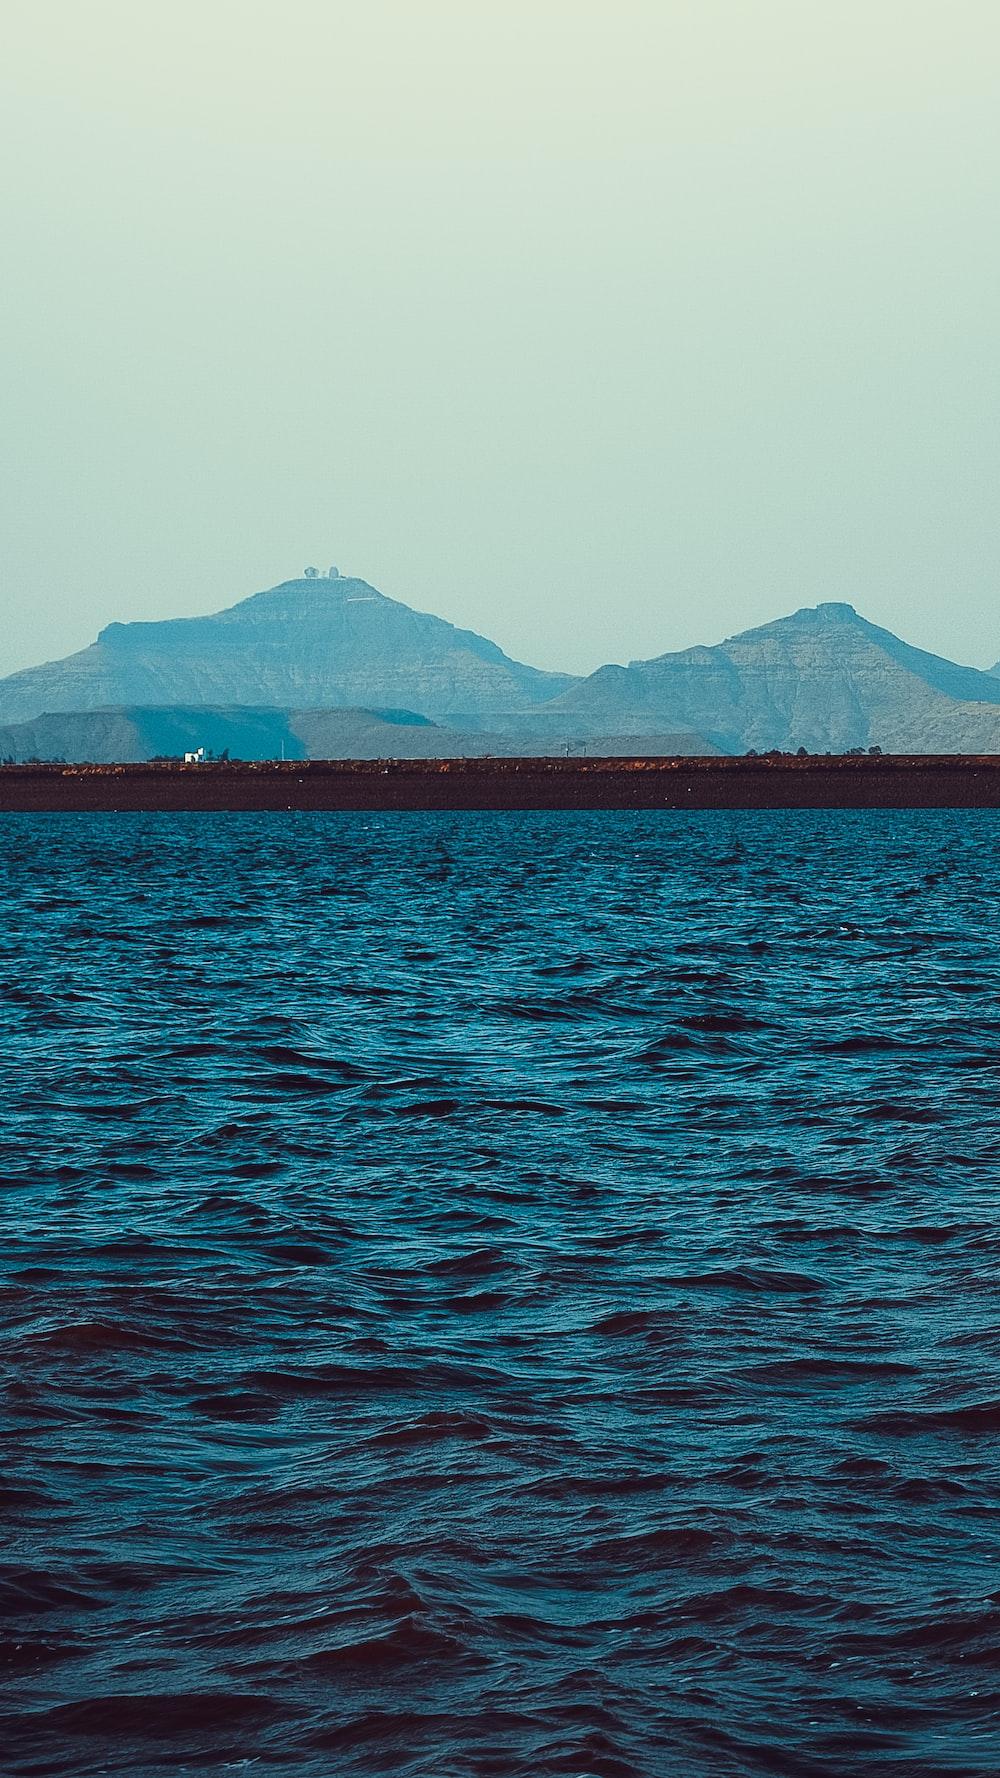 blue calm sea viewing mountain